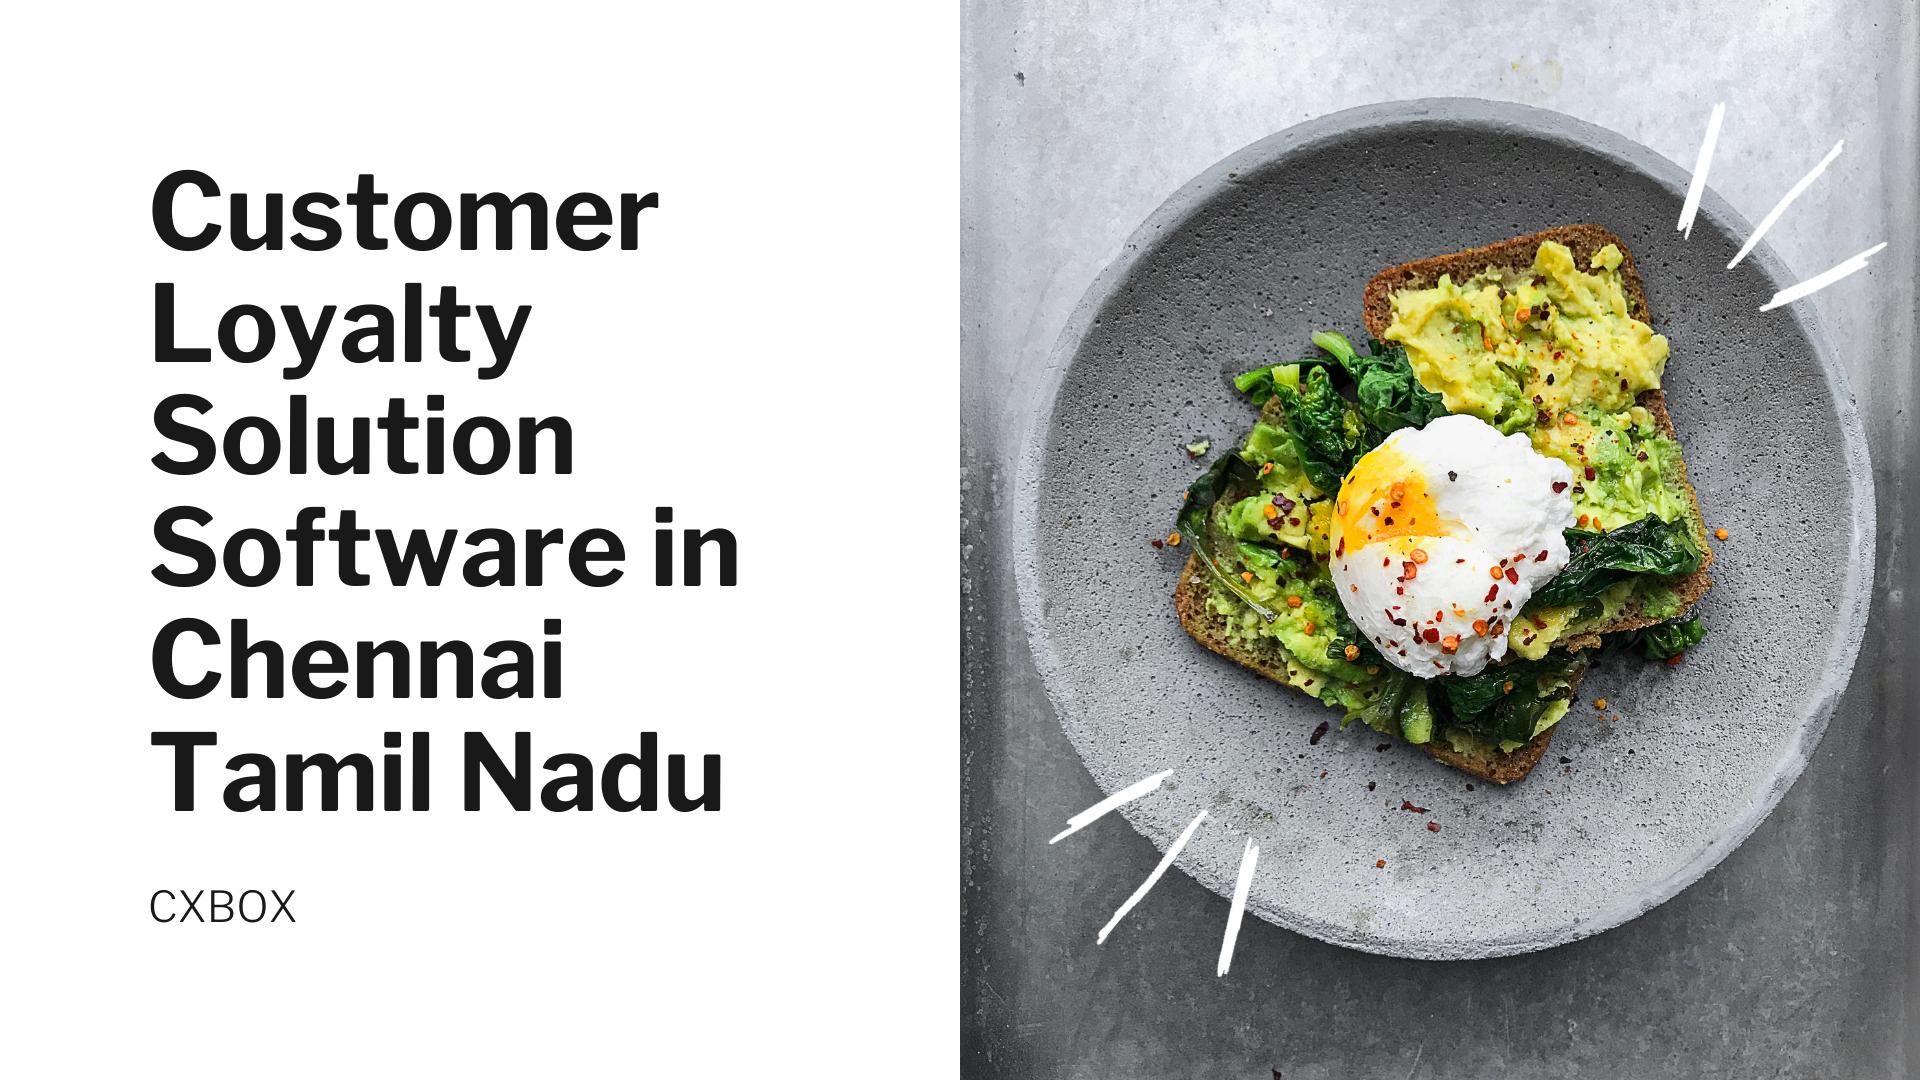 Customer Loyalty Solution Software in Chennai Tamil Nadu